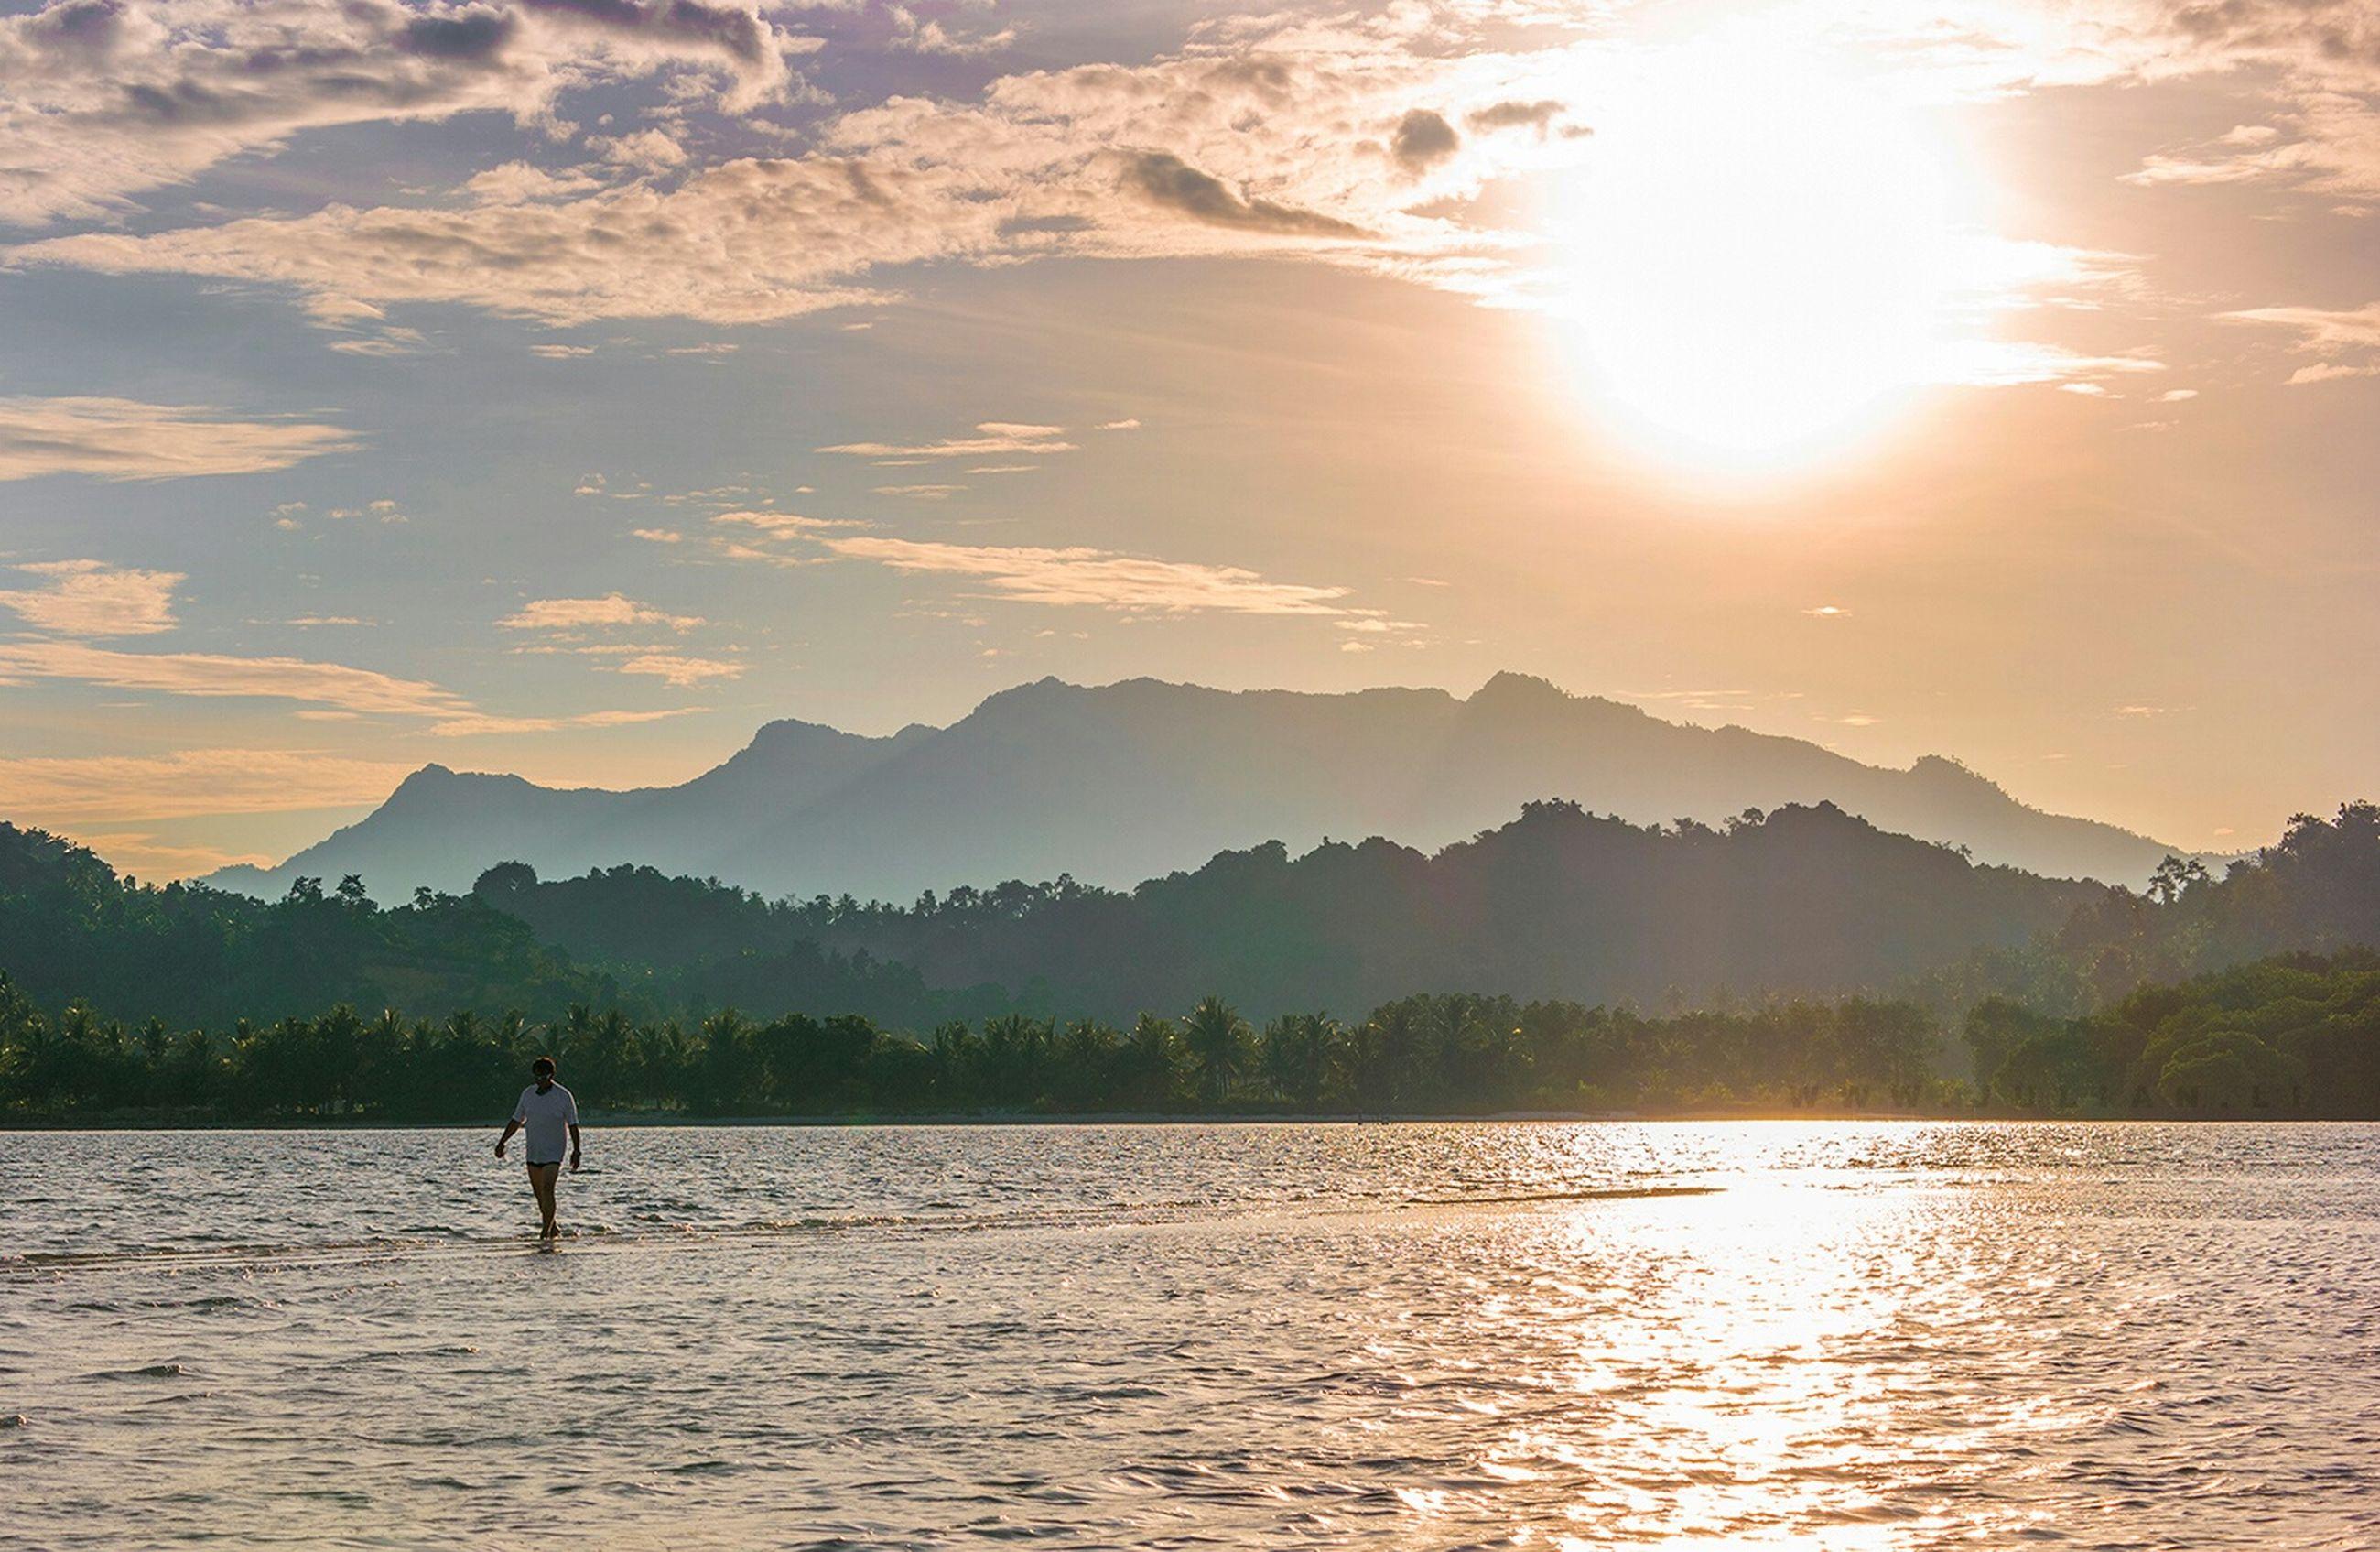 water, mountain, sunset, tranquil scene, scenics, tranquility, silhouette, sun, lake, beauty in nature, waterfront, sky, mountain range, reflection, nature, rippled, sunlight, idyllic, river, sunbeam